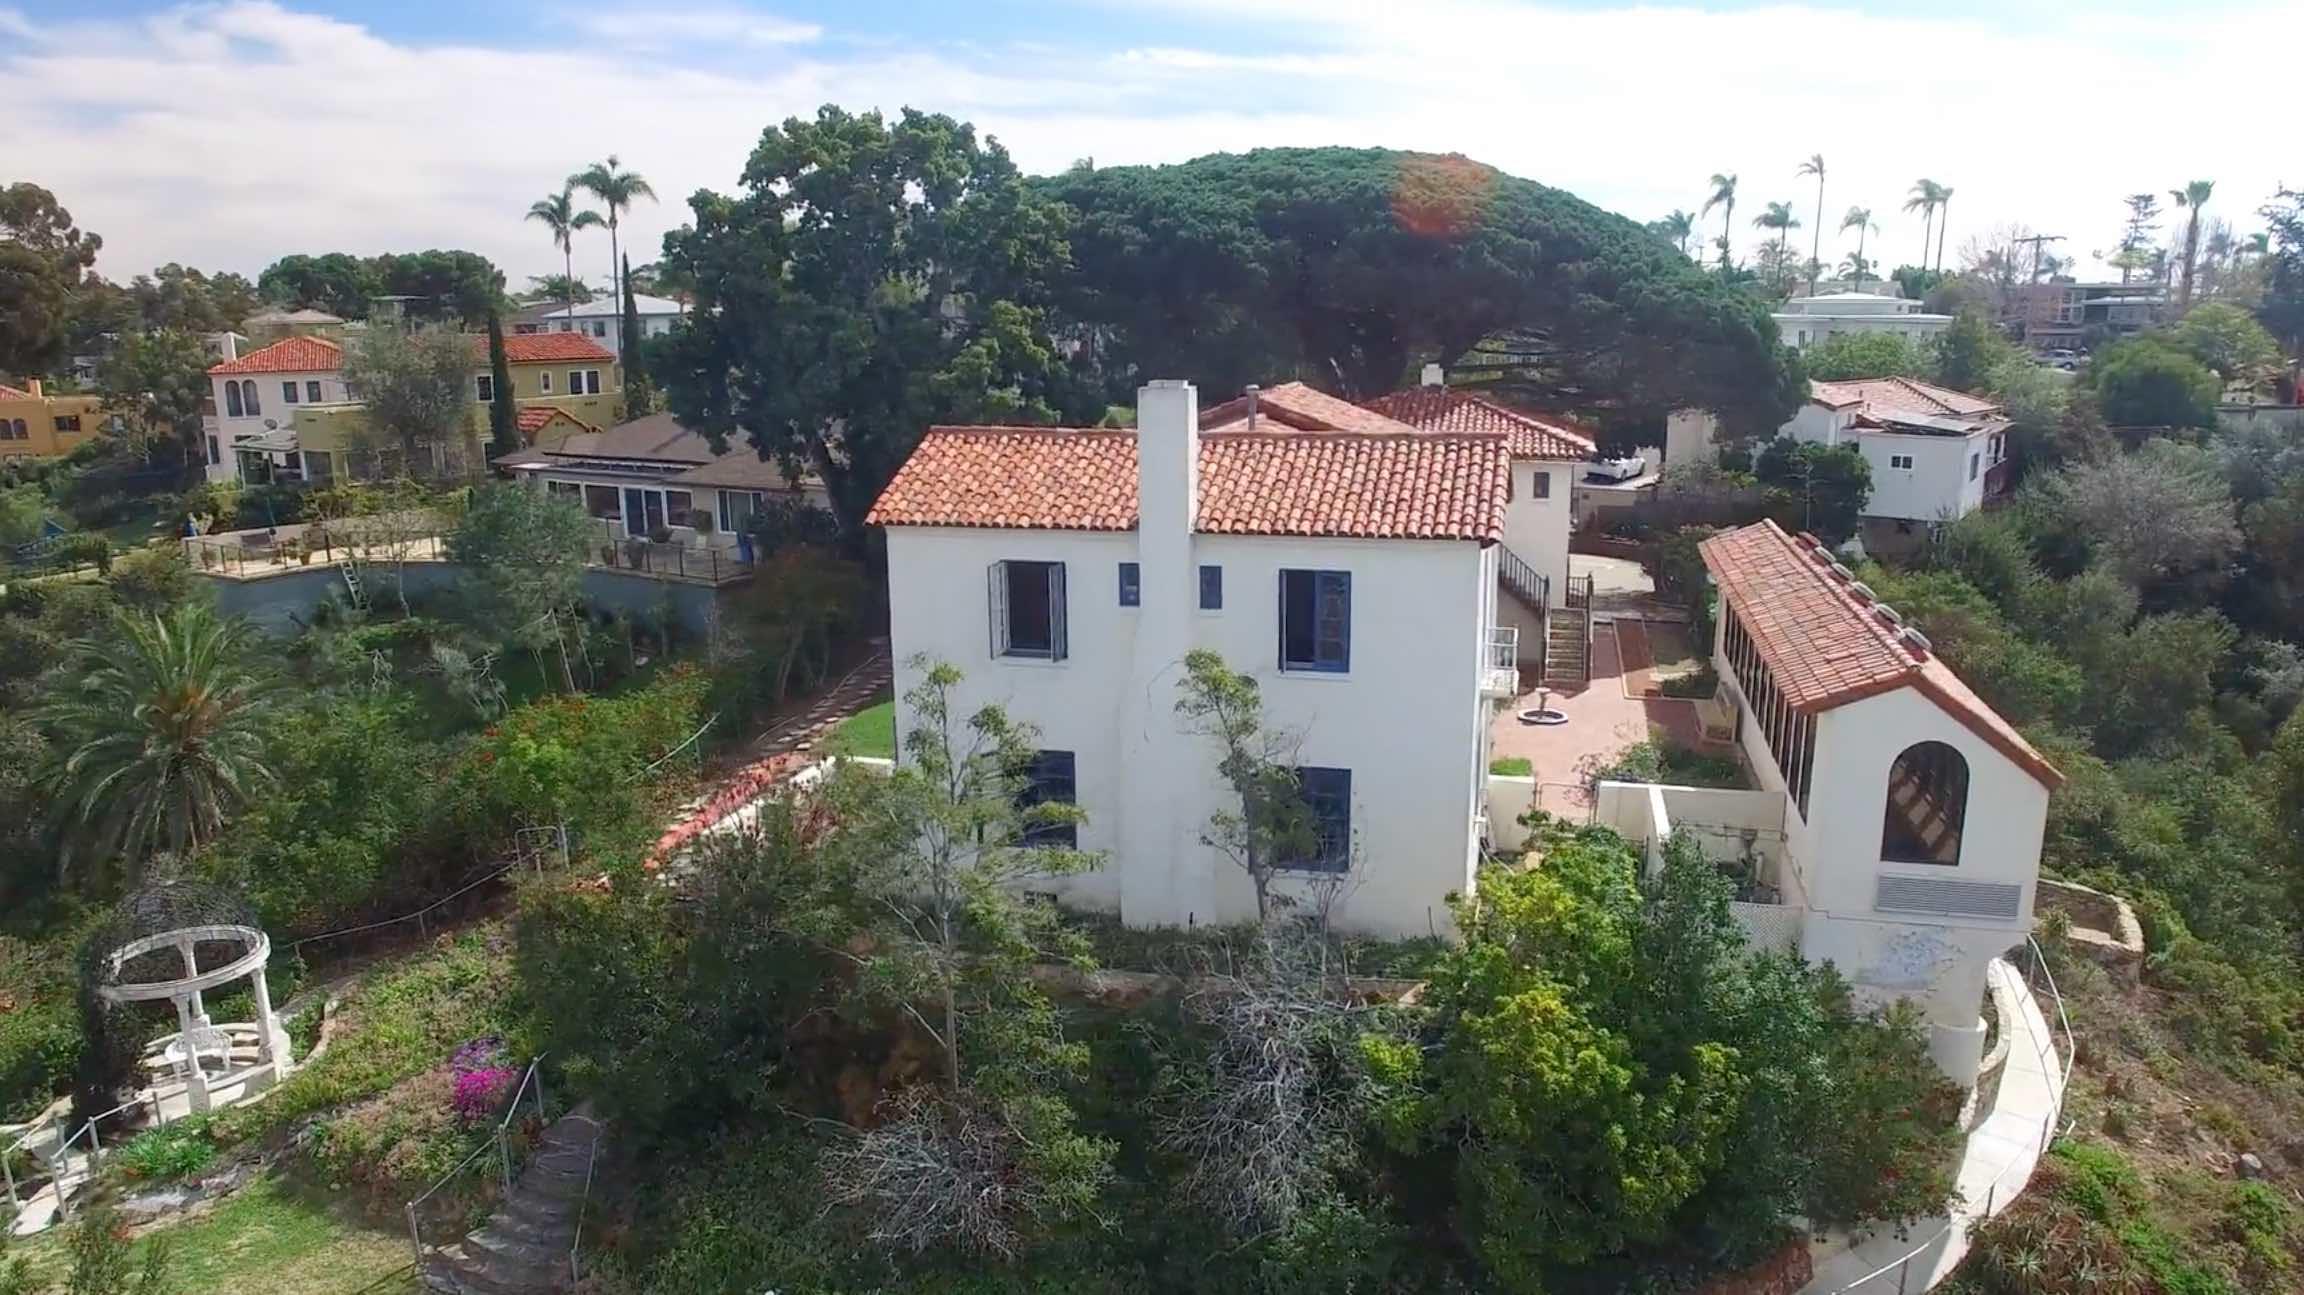 Villa-Hermosa-Aerial-10